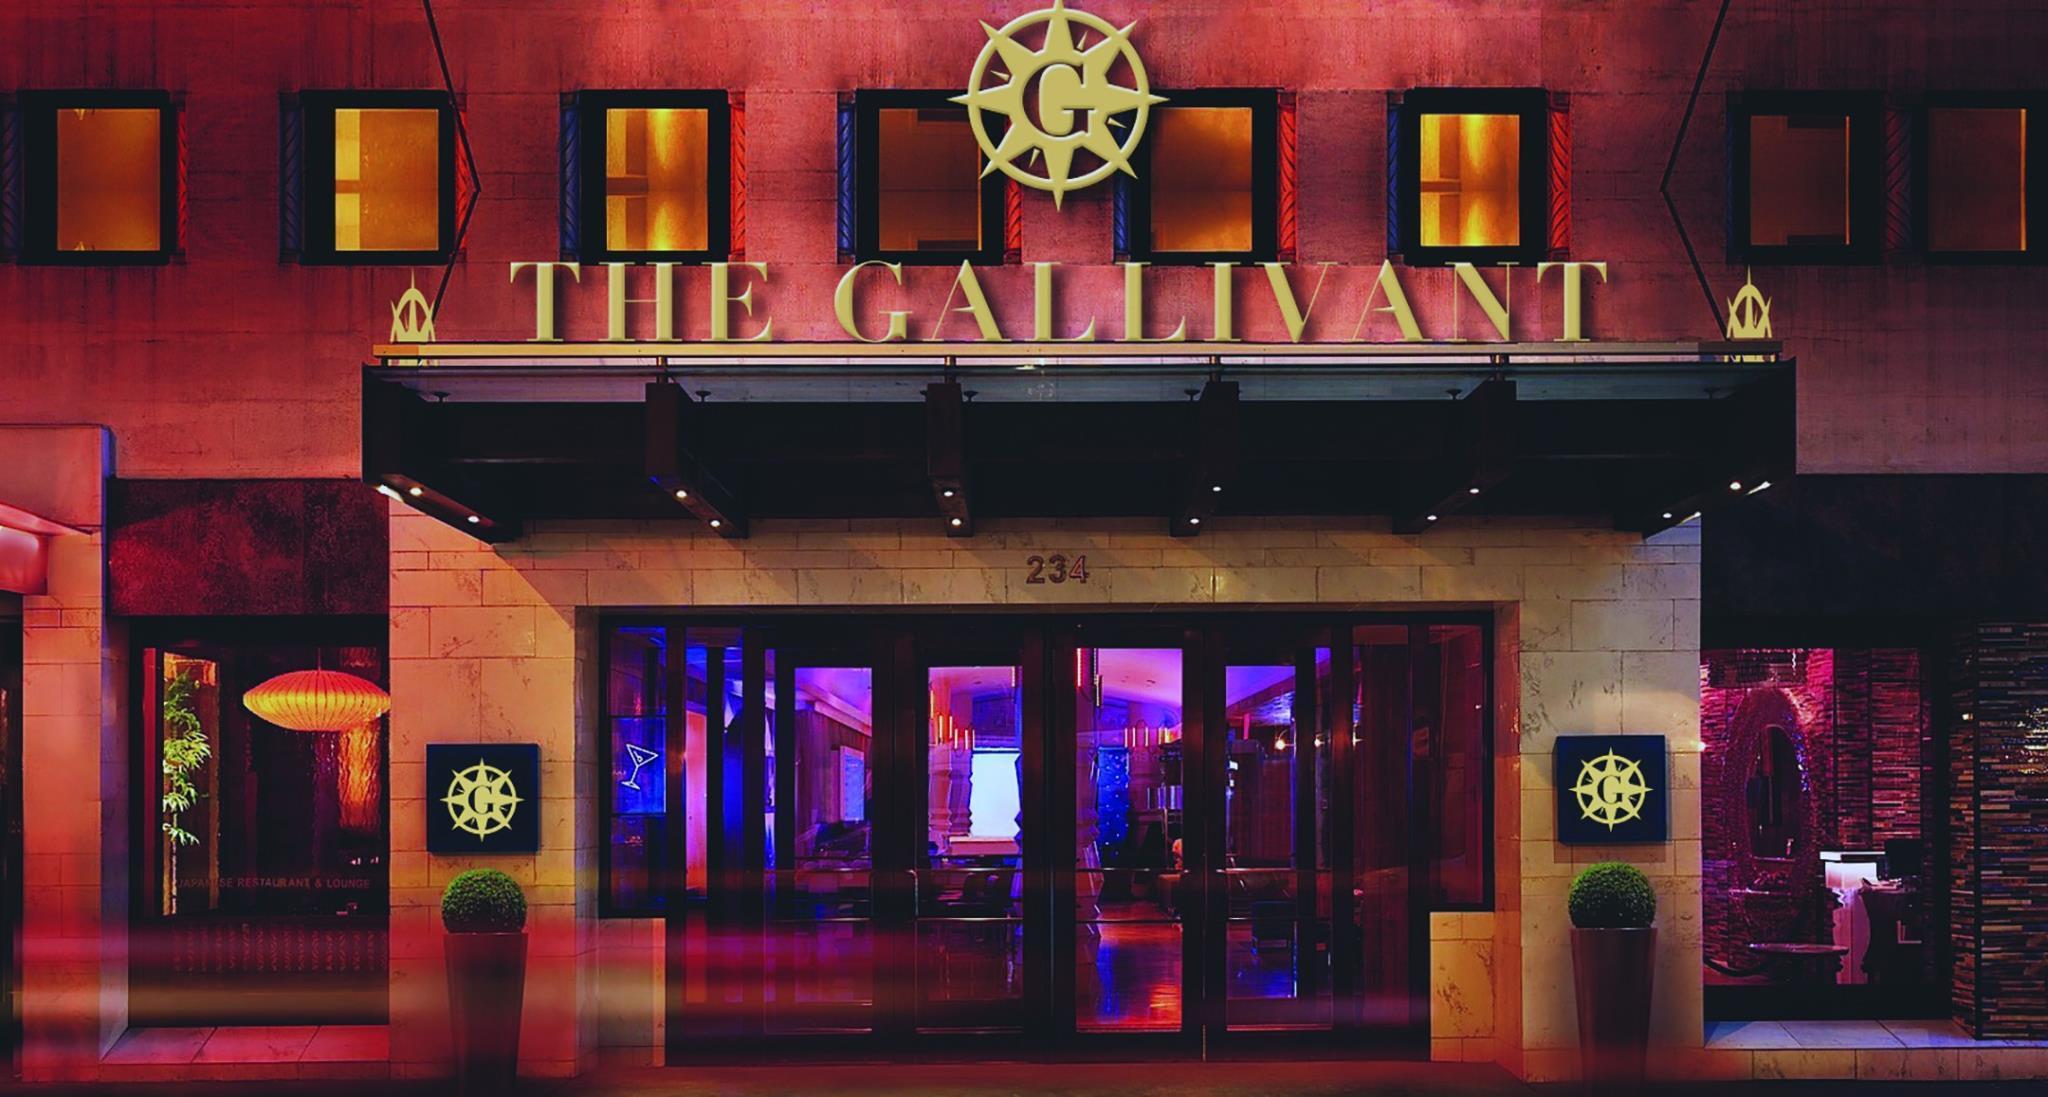 The Gallivant Times Square image